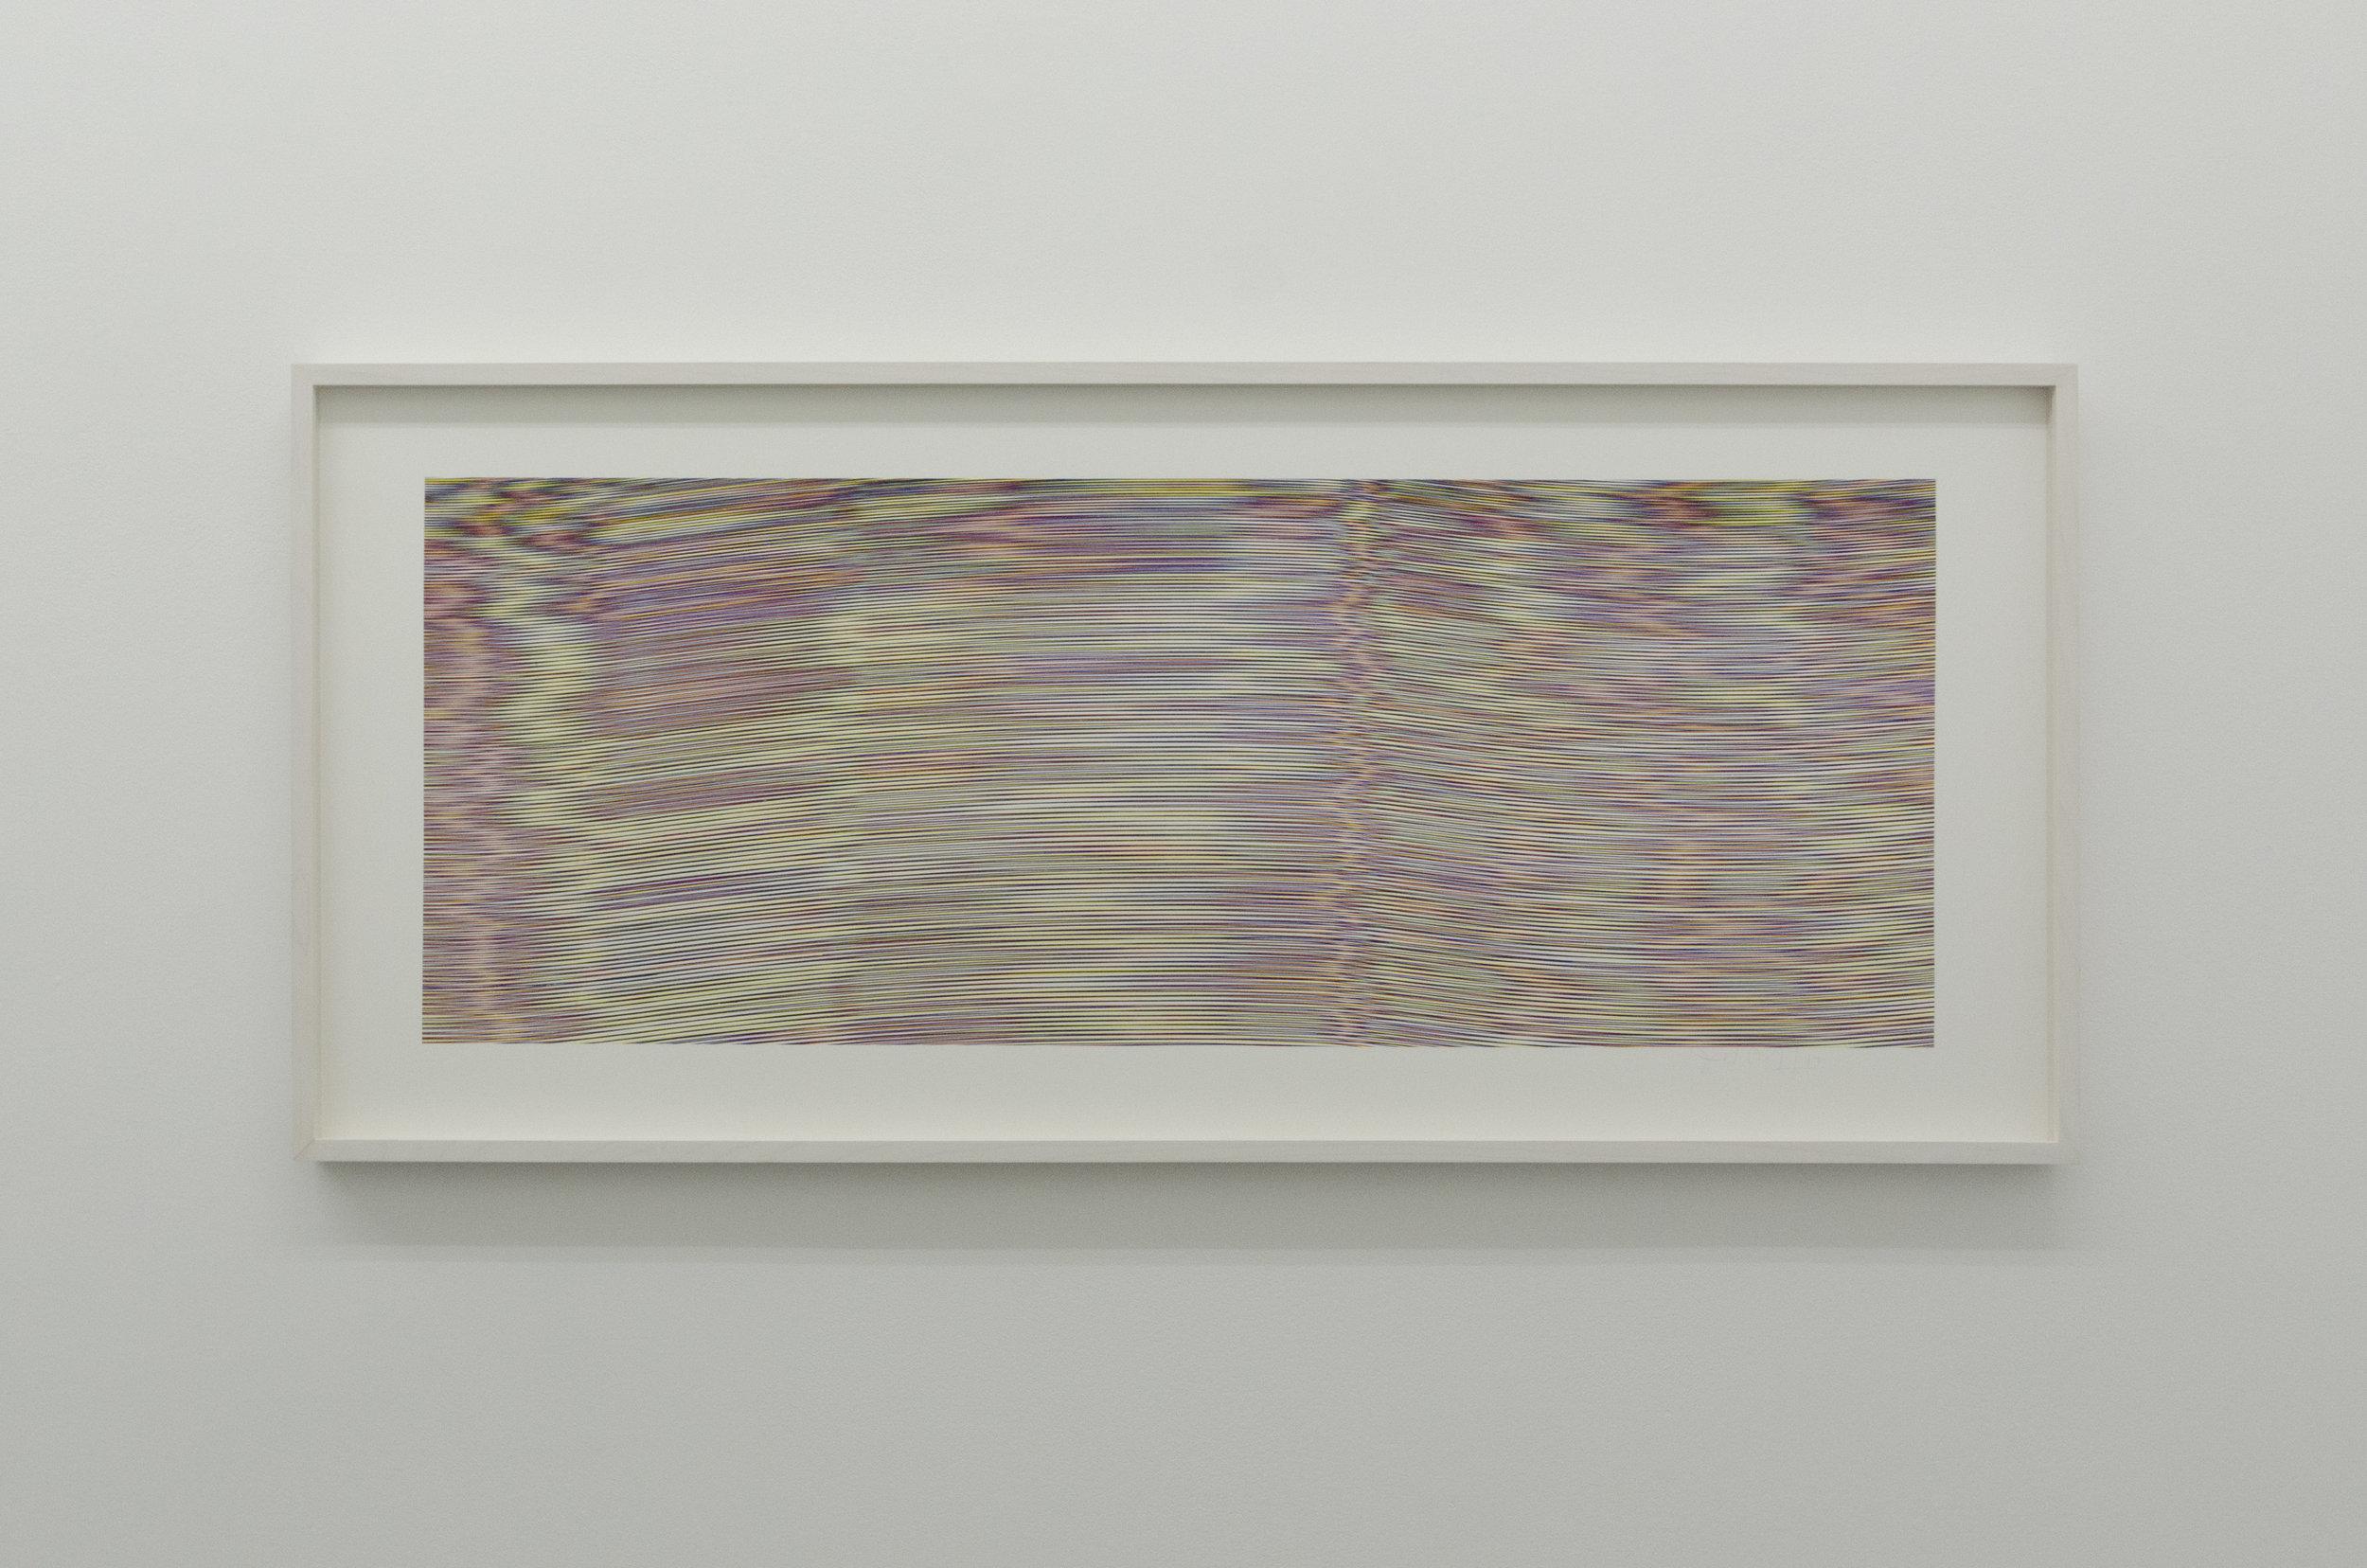 Current (Hudson River) 3 by Jill Baroff